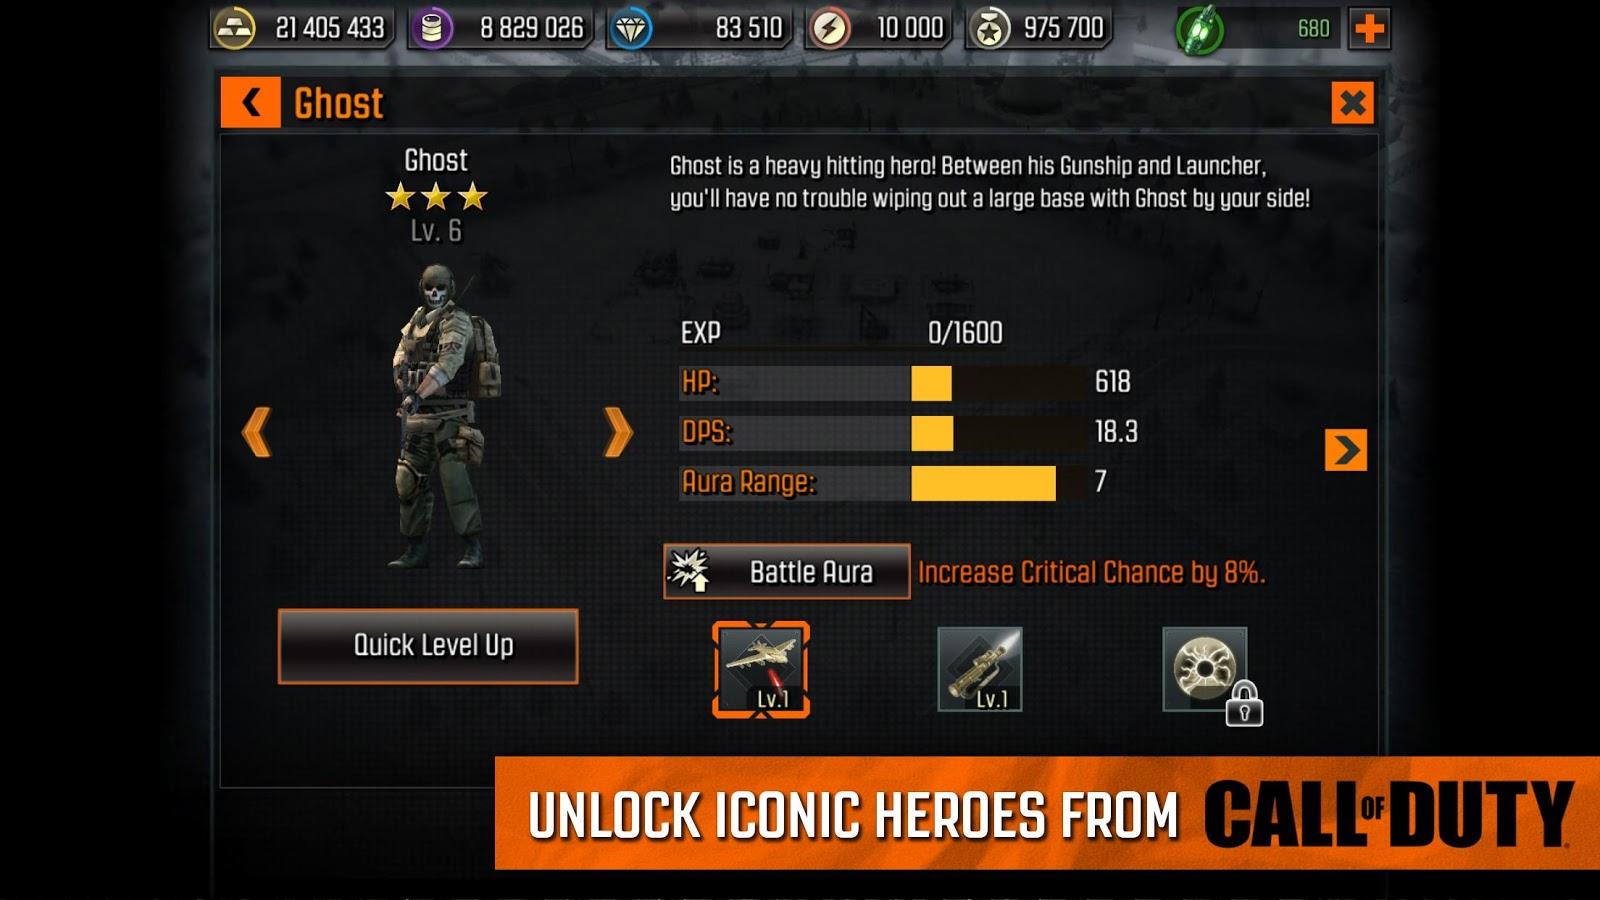 call of duty heroes mod apk 4.5.0